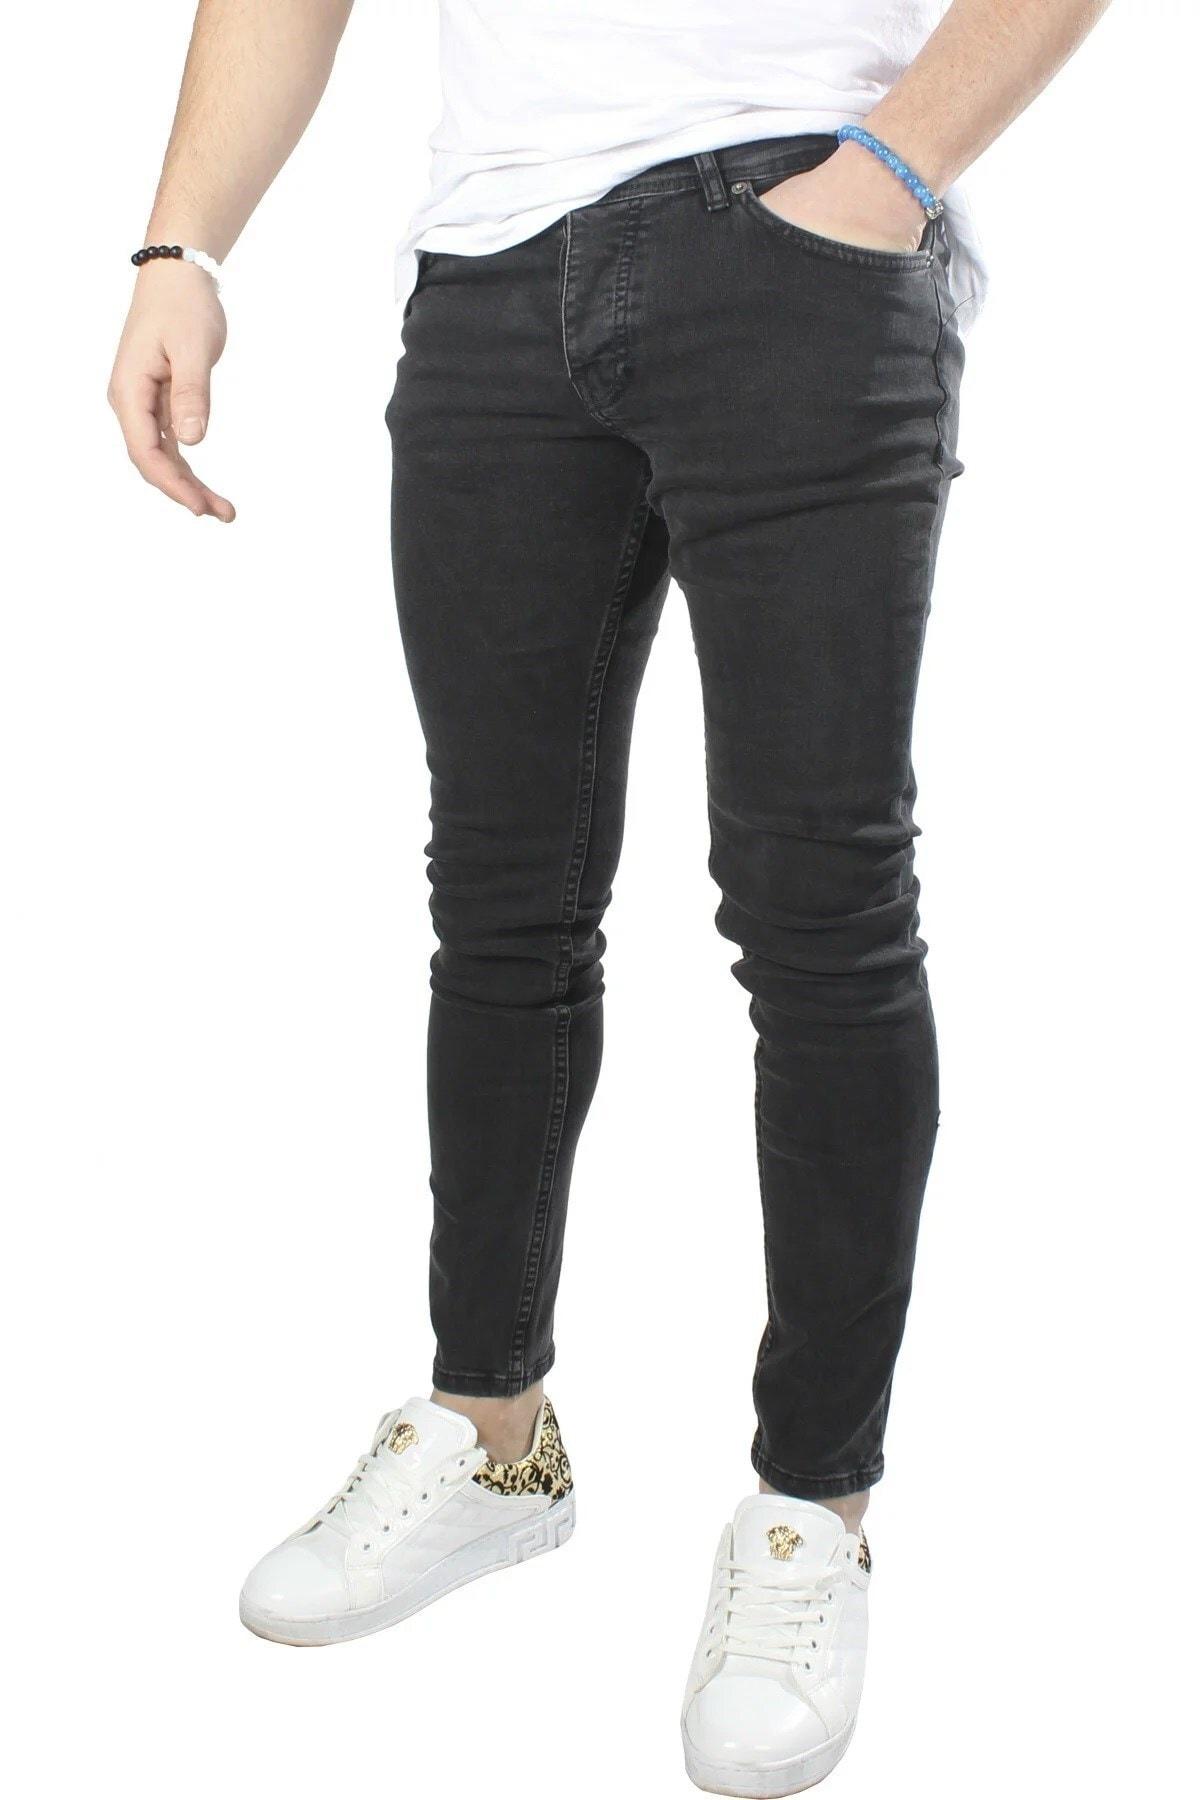 Terapi Men Erkek Kot Pantolon 9K-2100317-008 Füme 0